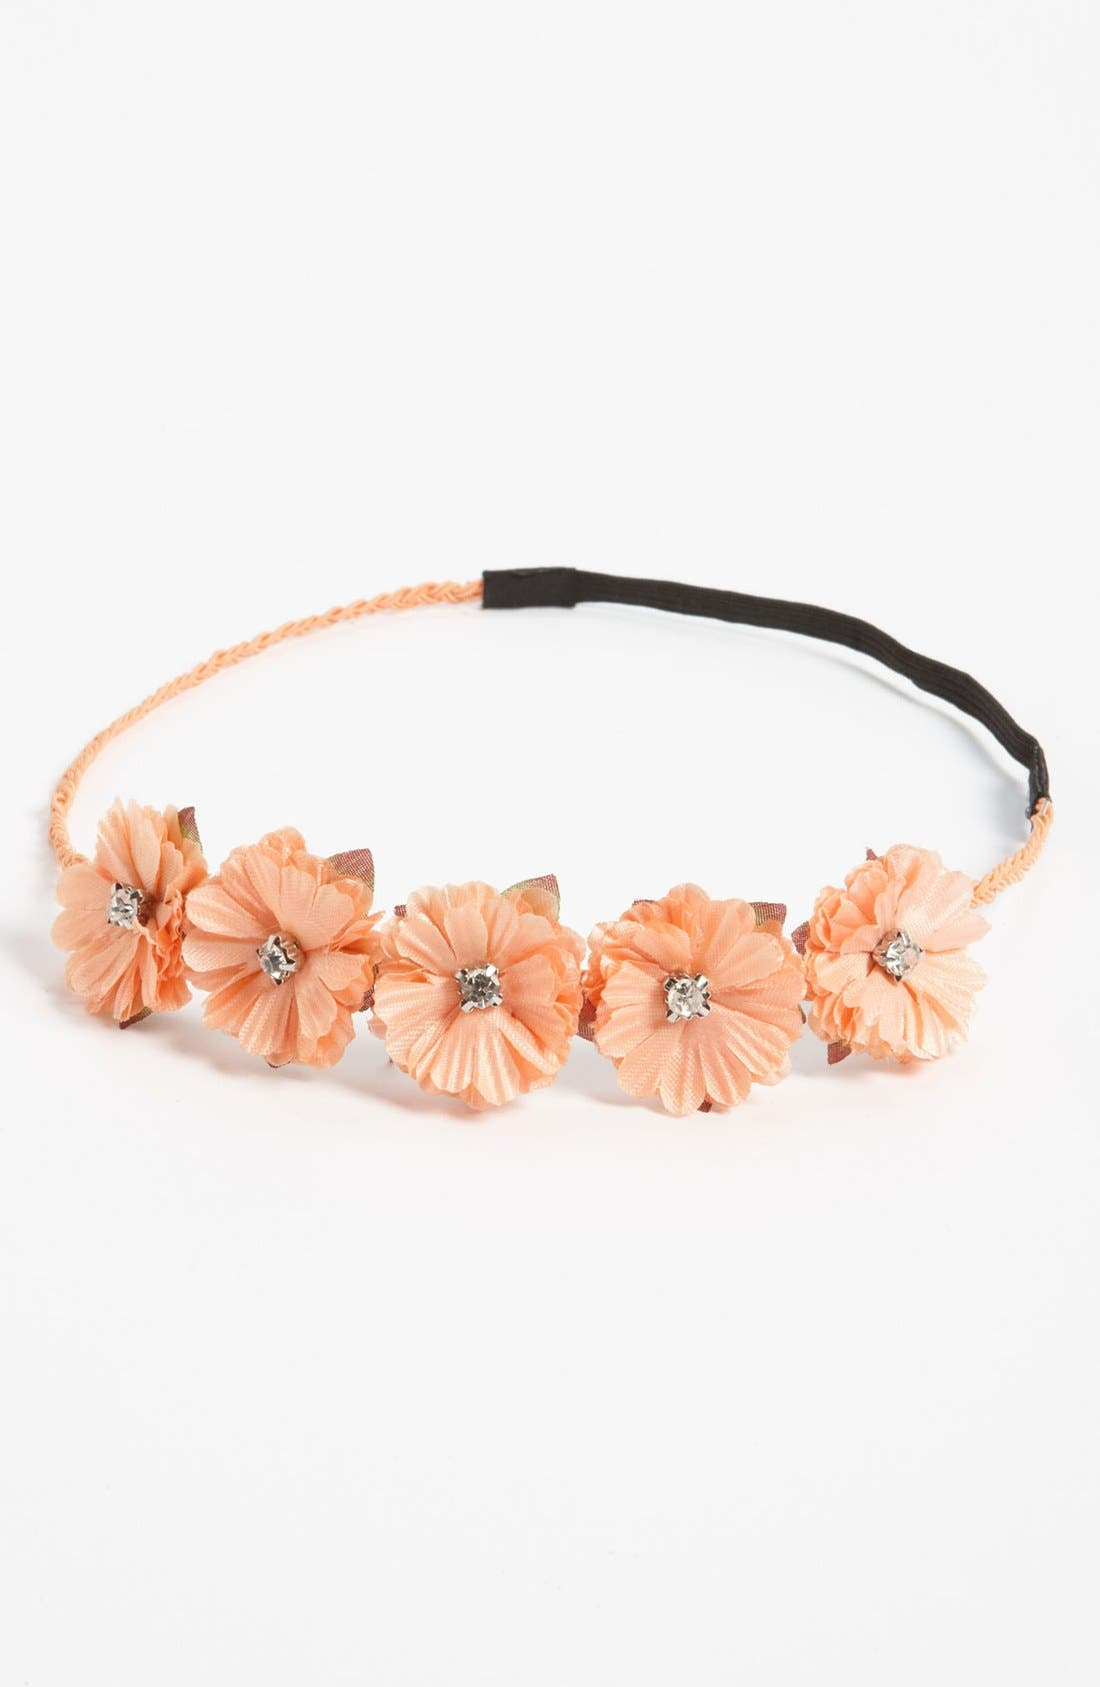 Alternate Image 1 Selected - Carole Rhinestone Accent Floral Headband